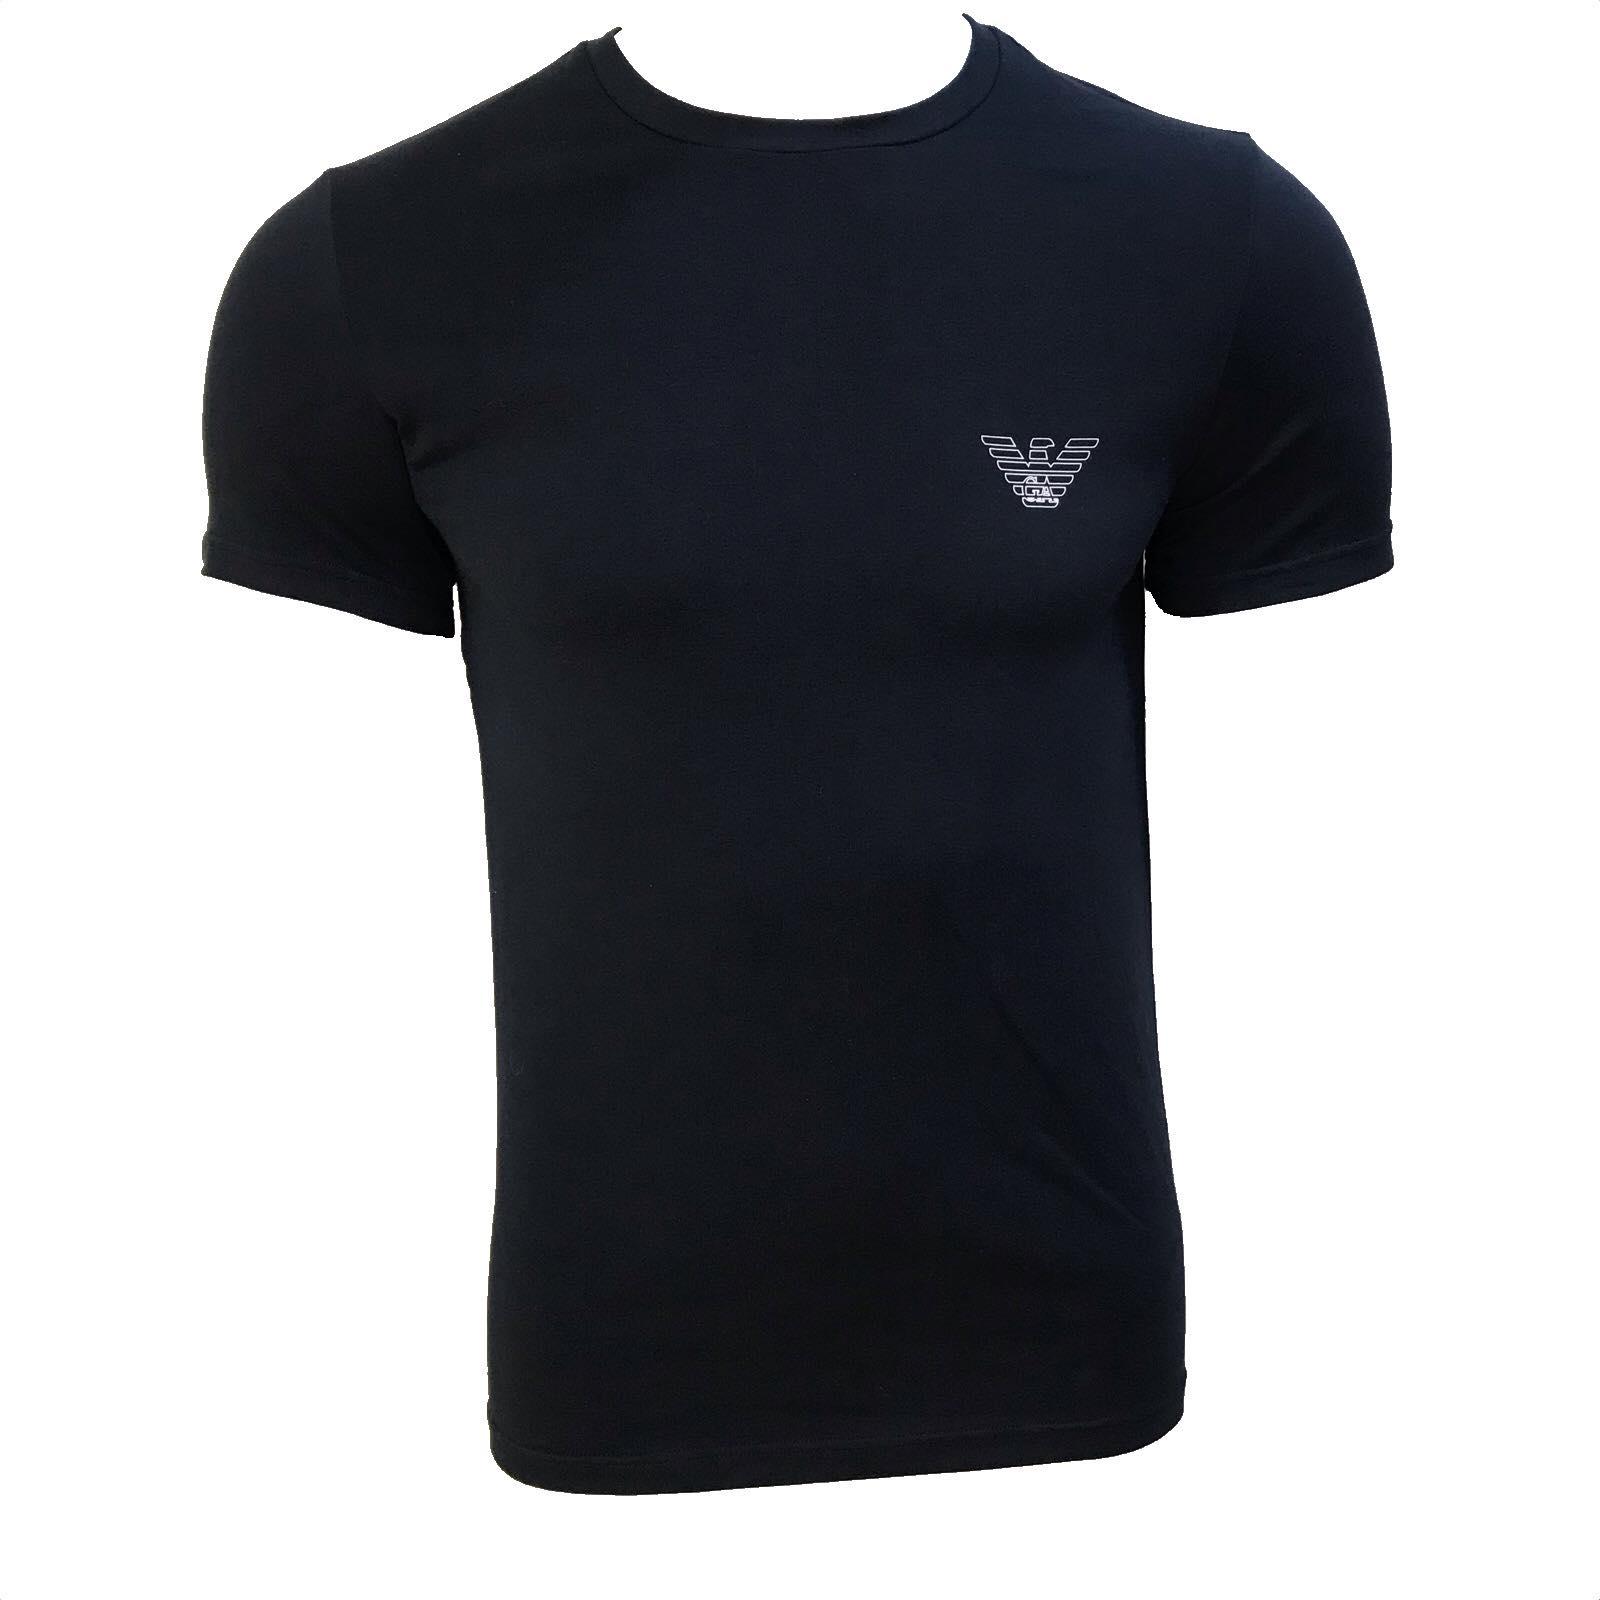 Camiseta Emporio Armani Underwear Básica Azul Marinho